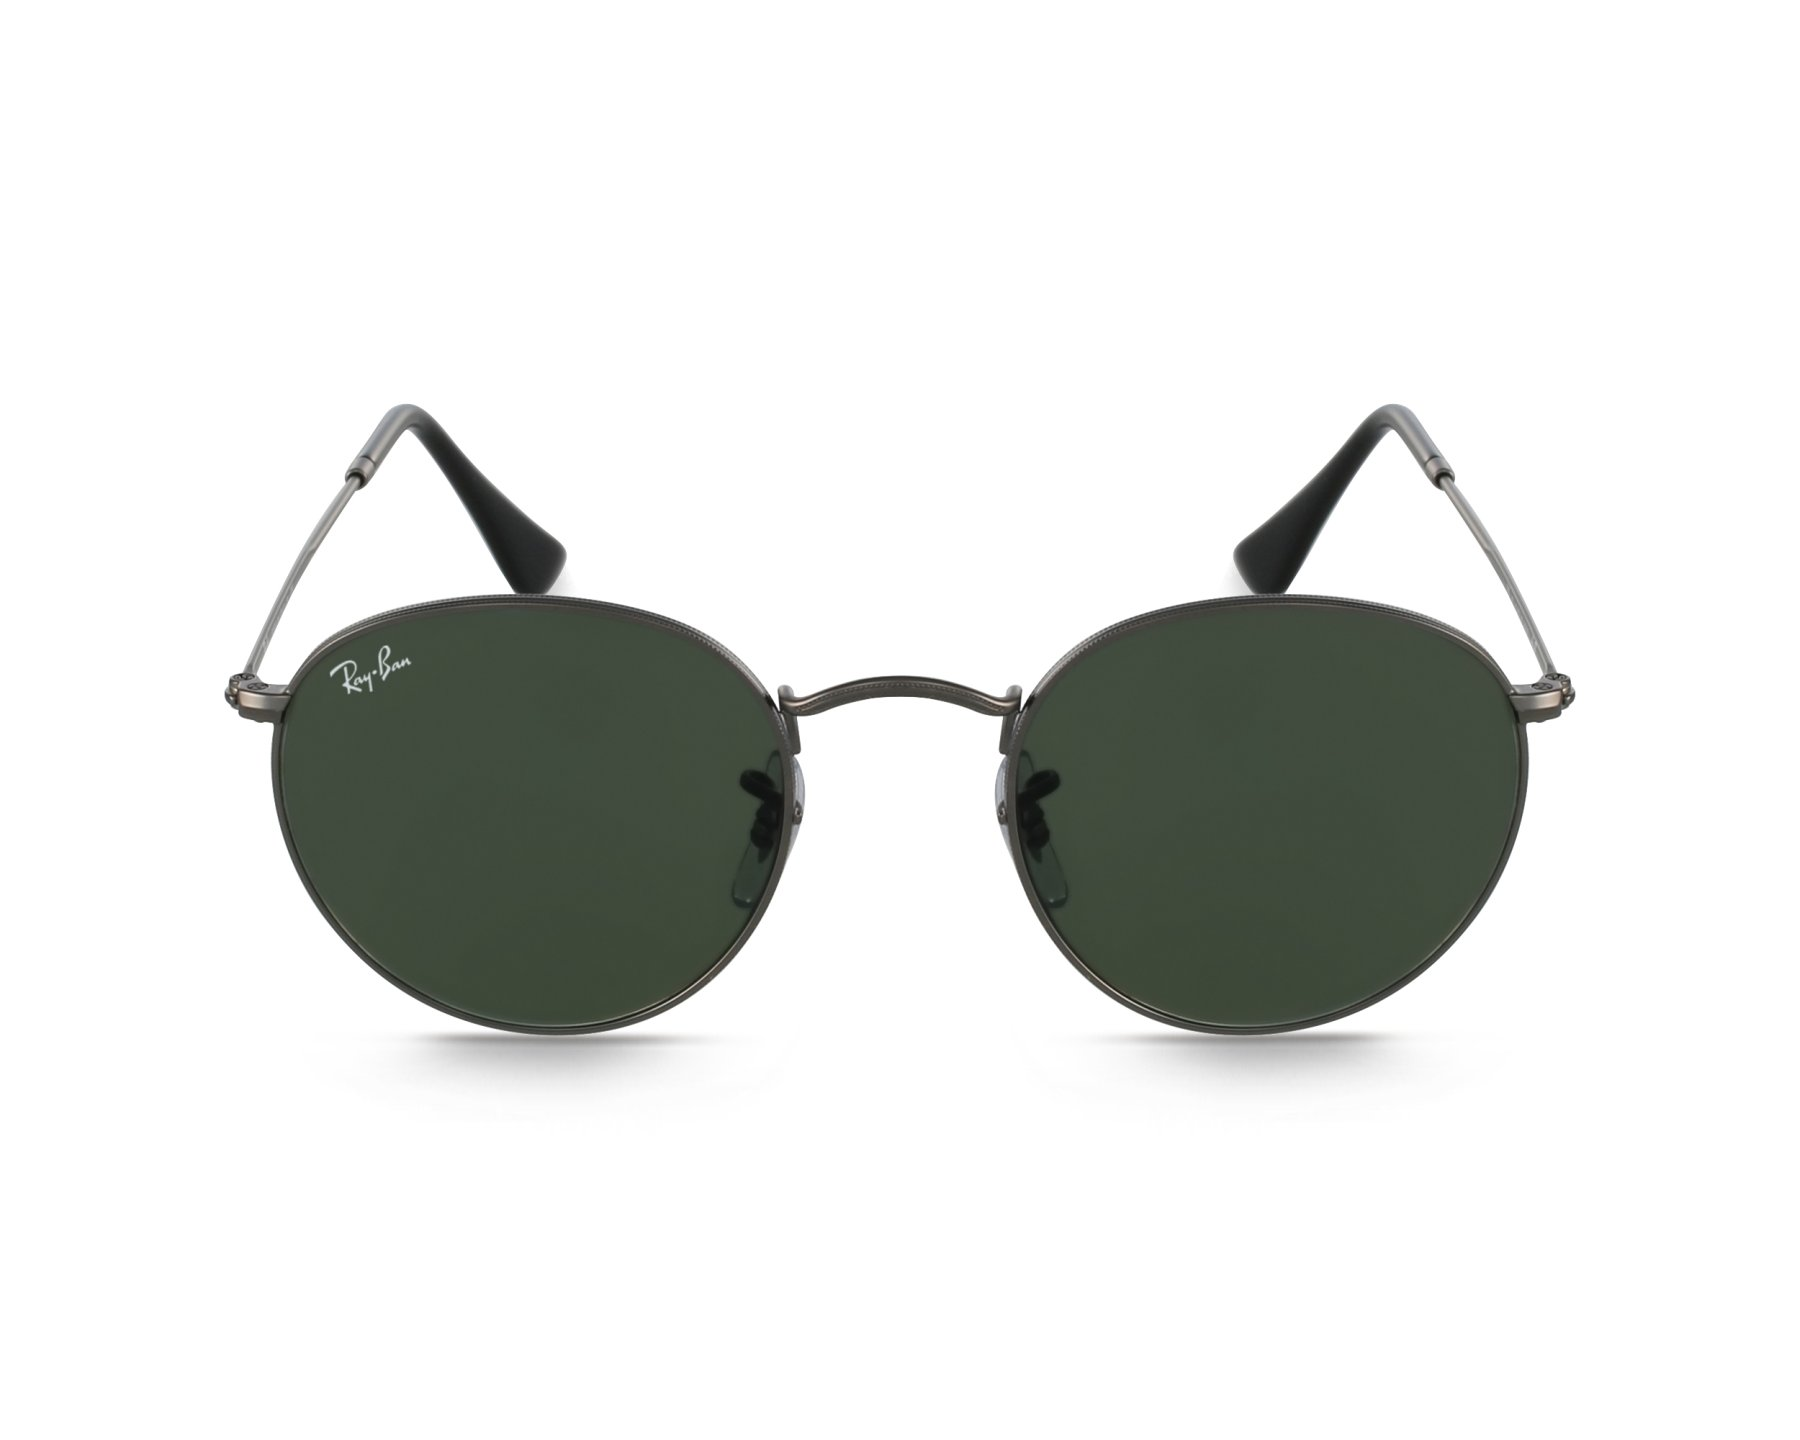 dc526e3c77bf5a Sunglasses Ray-Ban RB-3447 029 50-21 Grey profile view